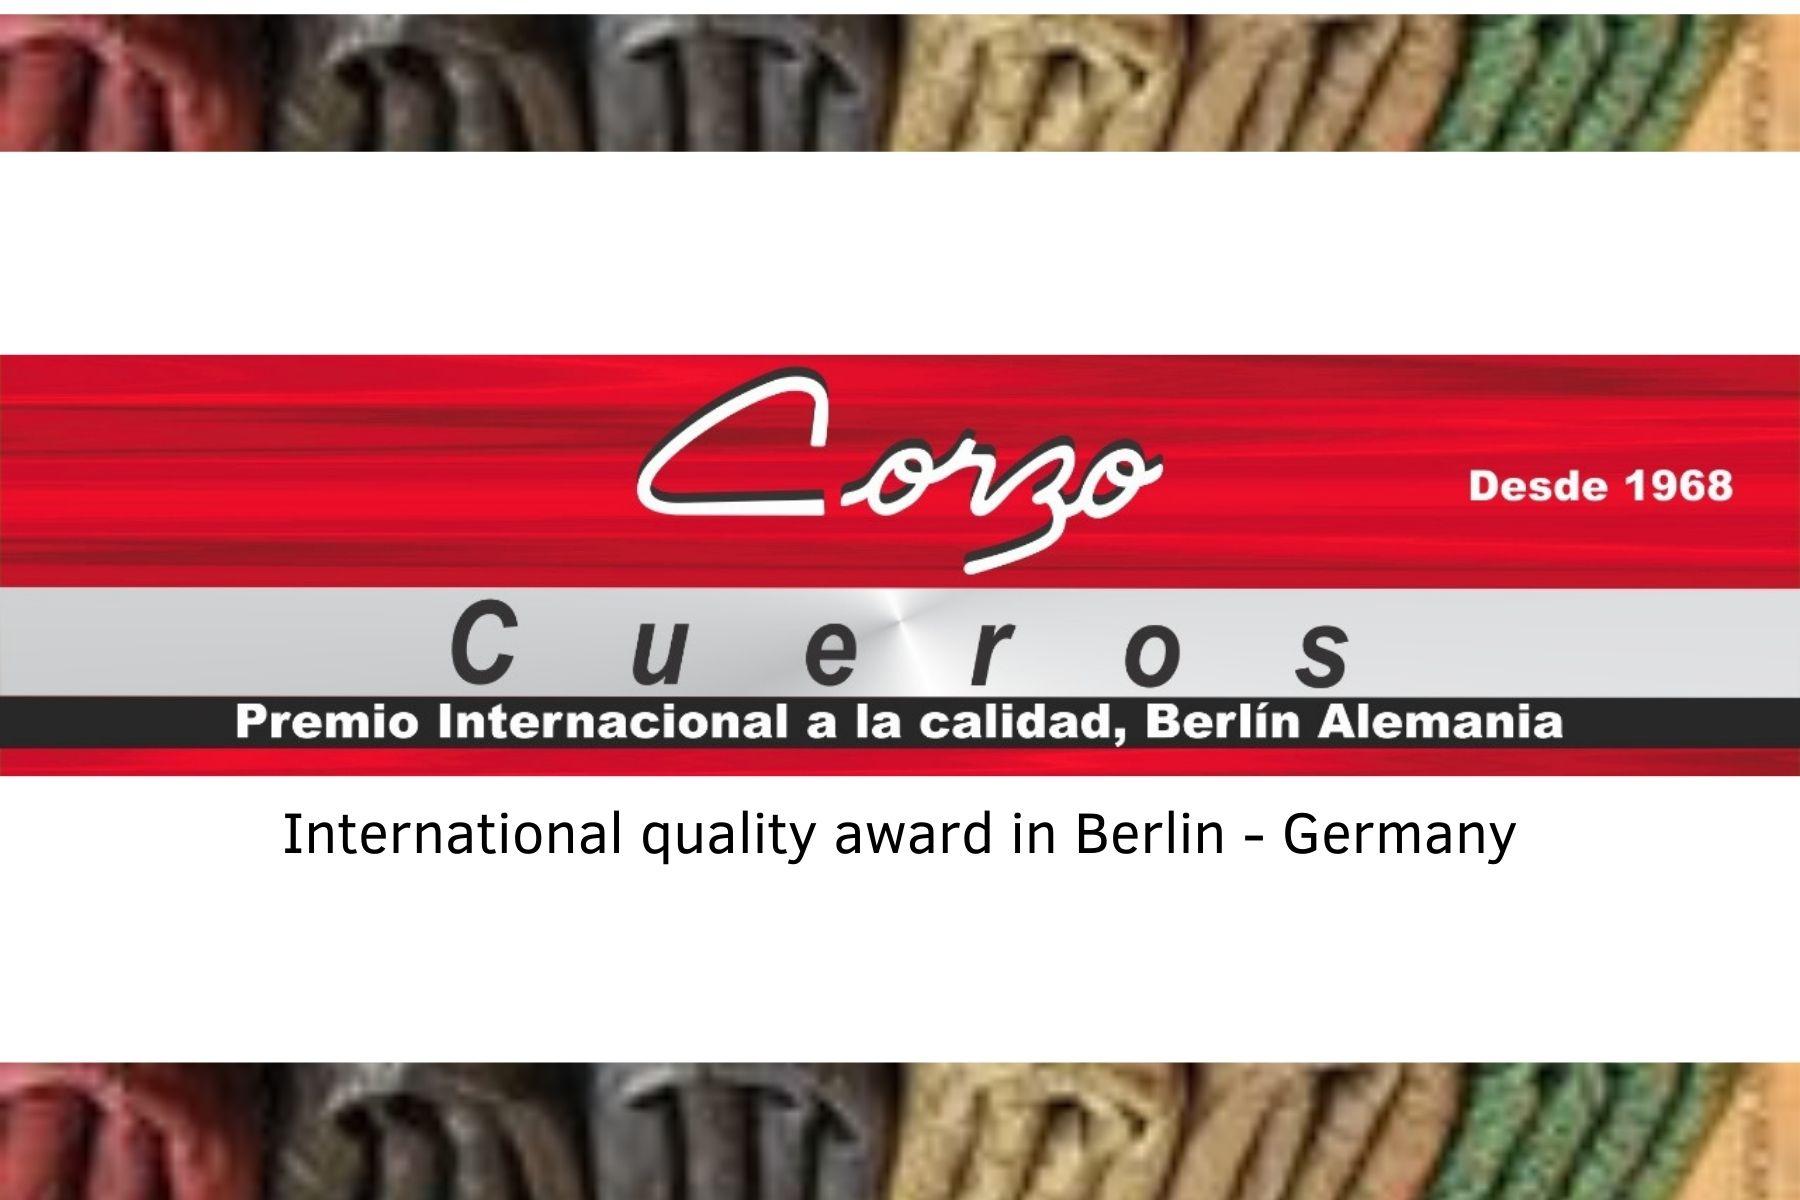 Corzo Cueros